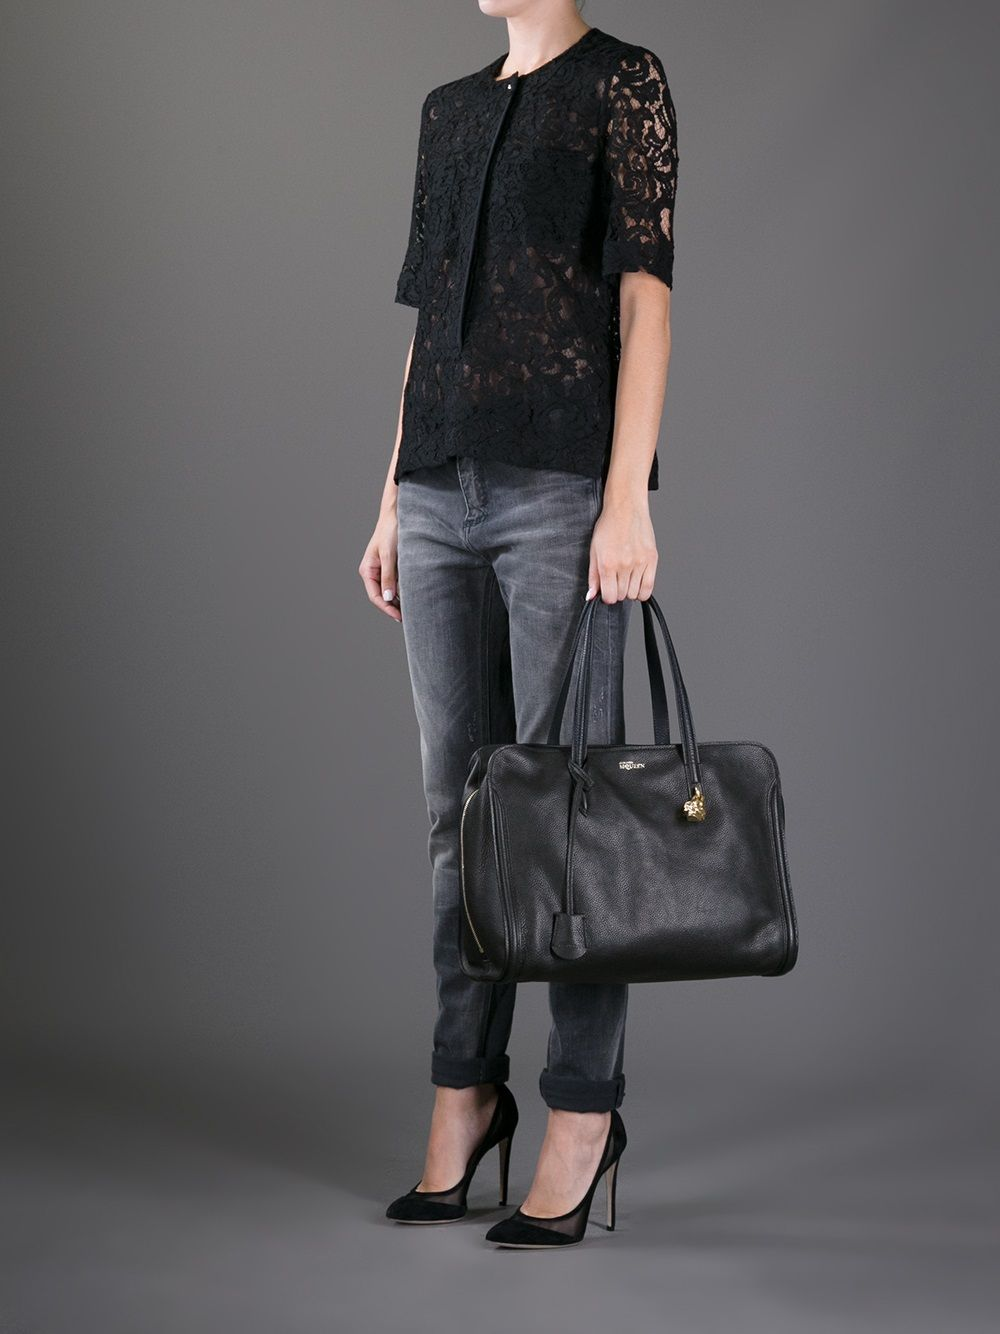 95b98b8862 Alexander McQueen Skull Padlock Top Handle Bag